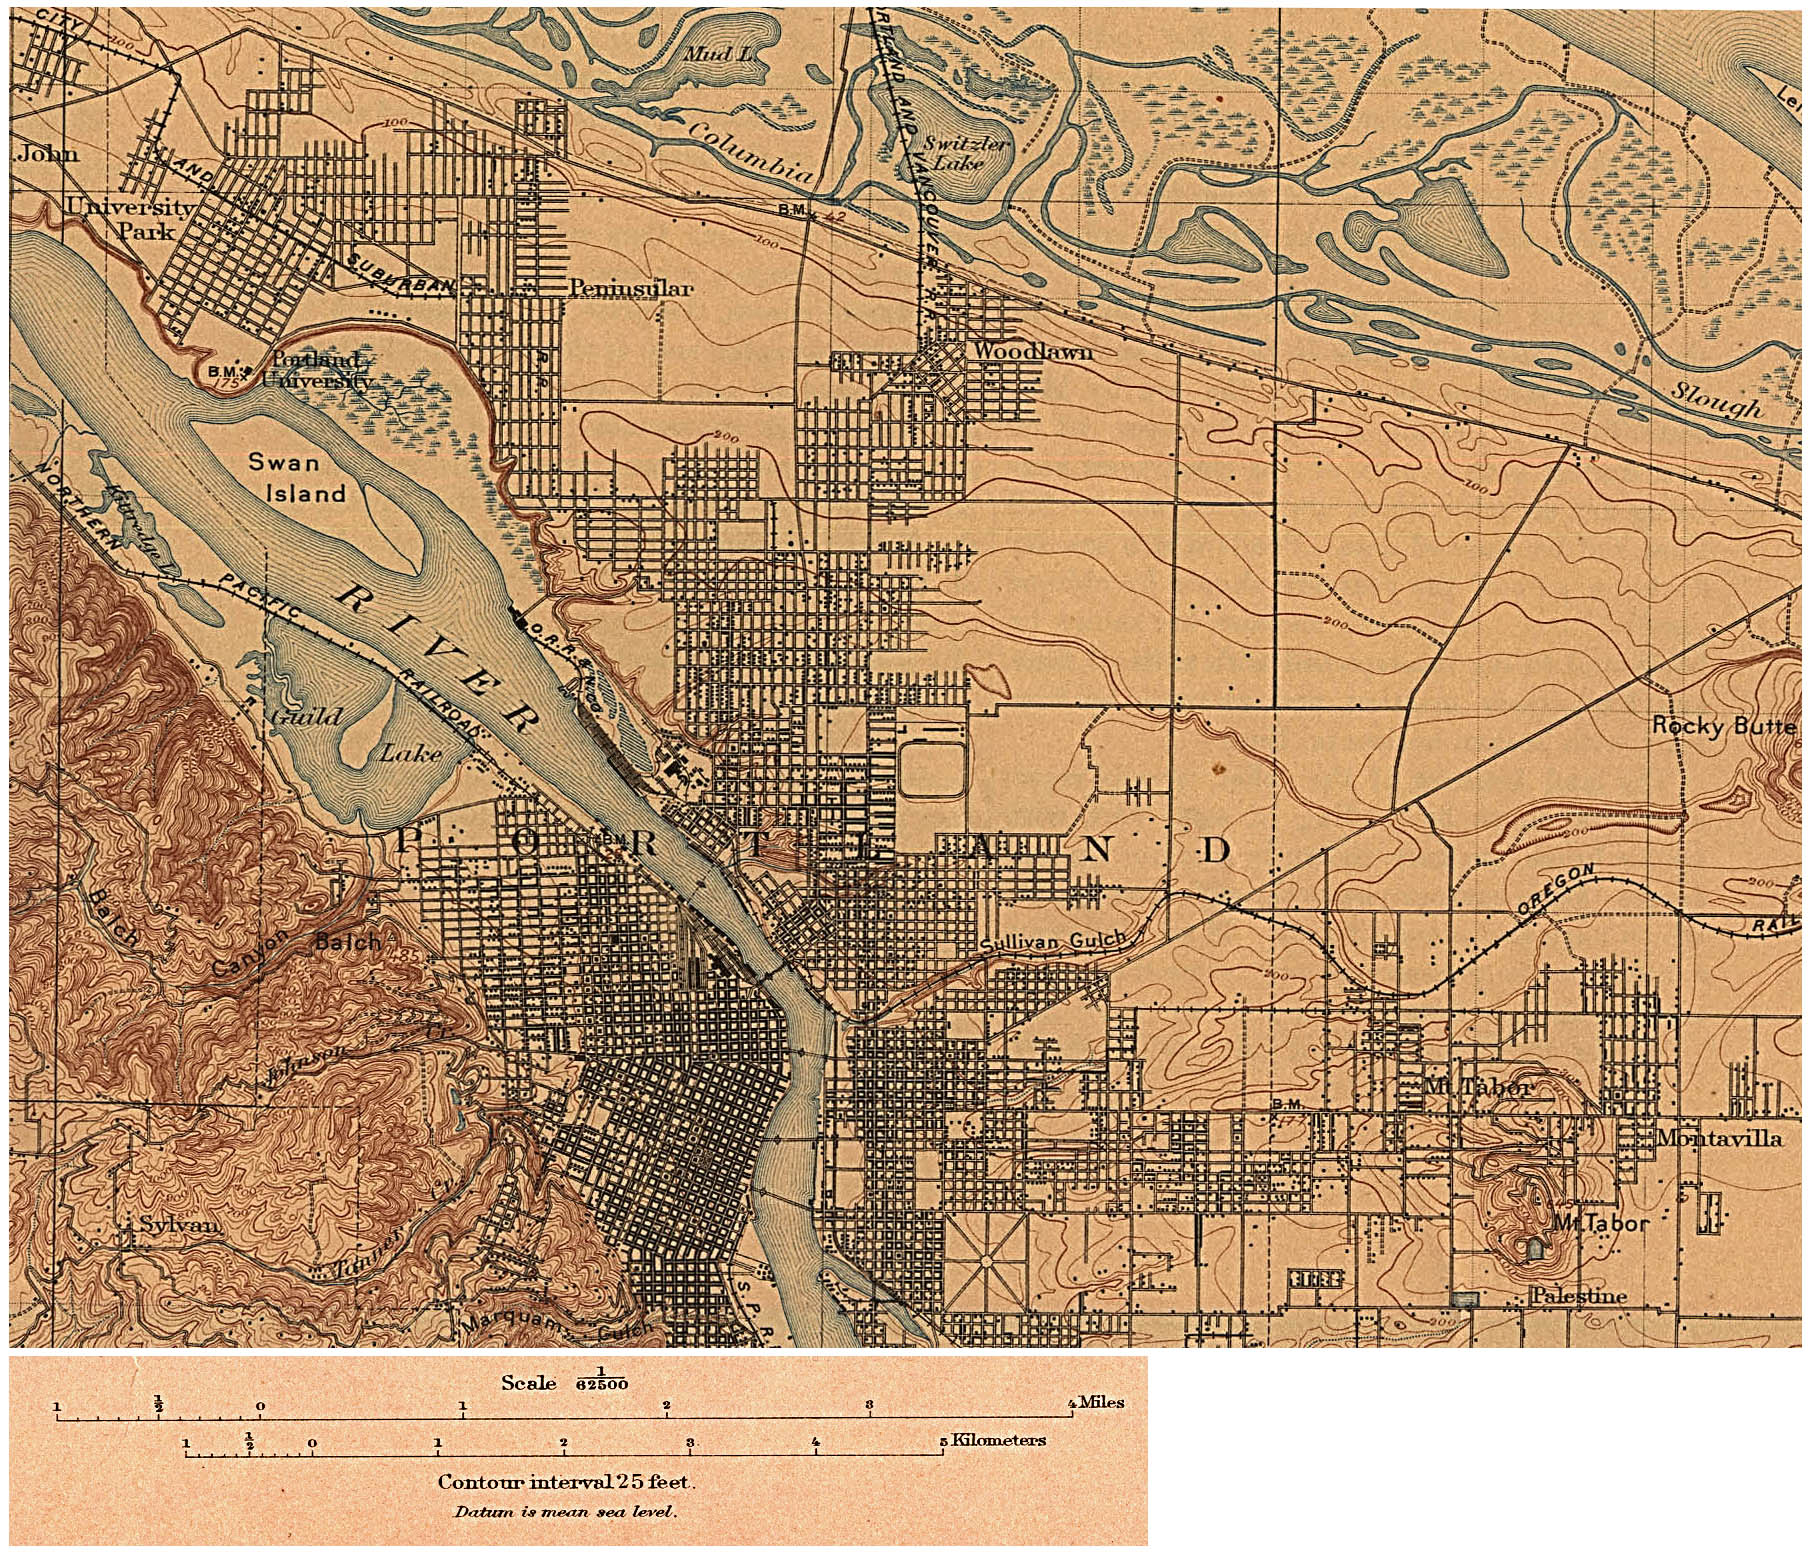 Portland City Map, Oregon, United States 1897